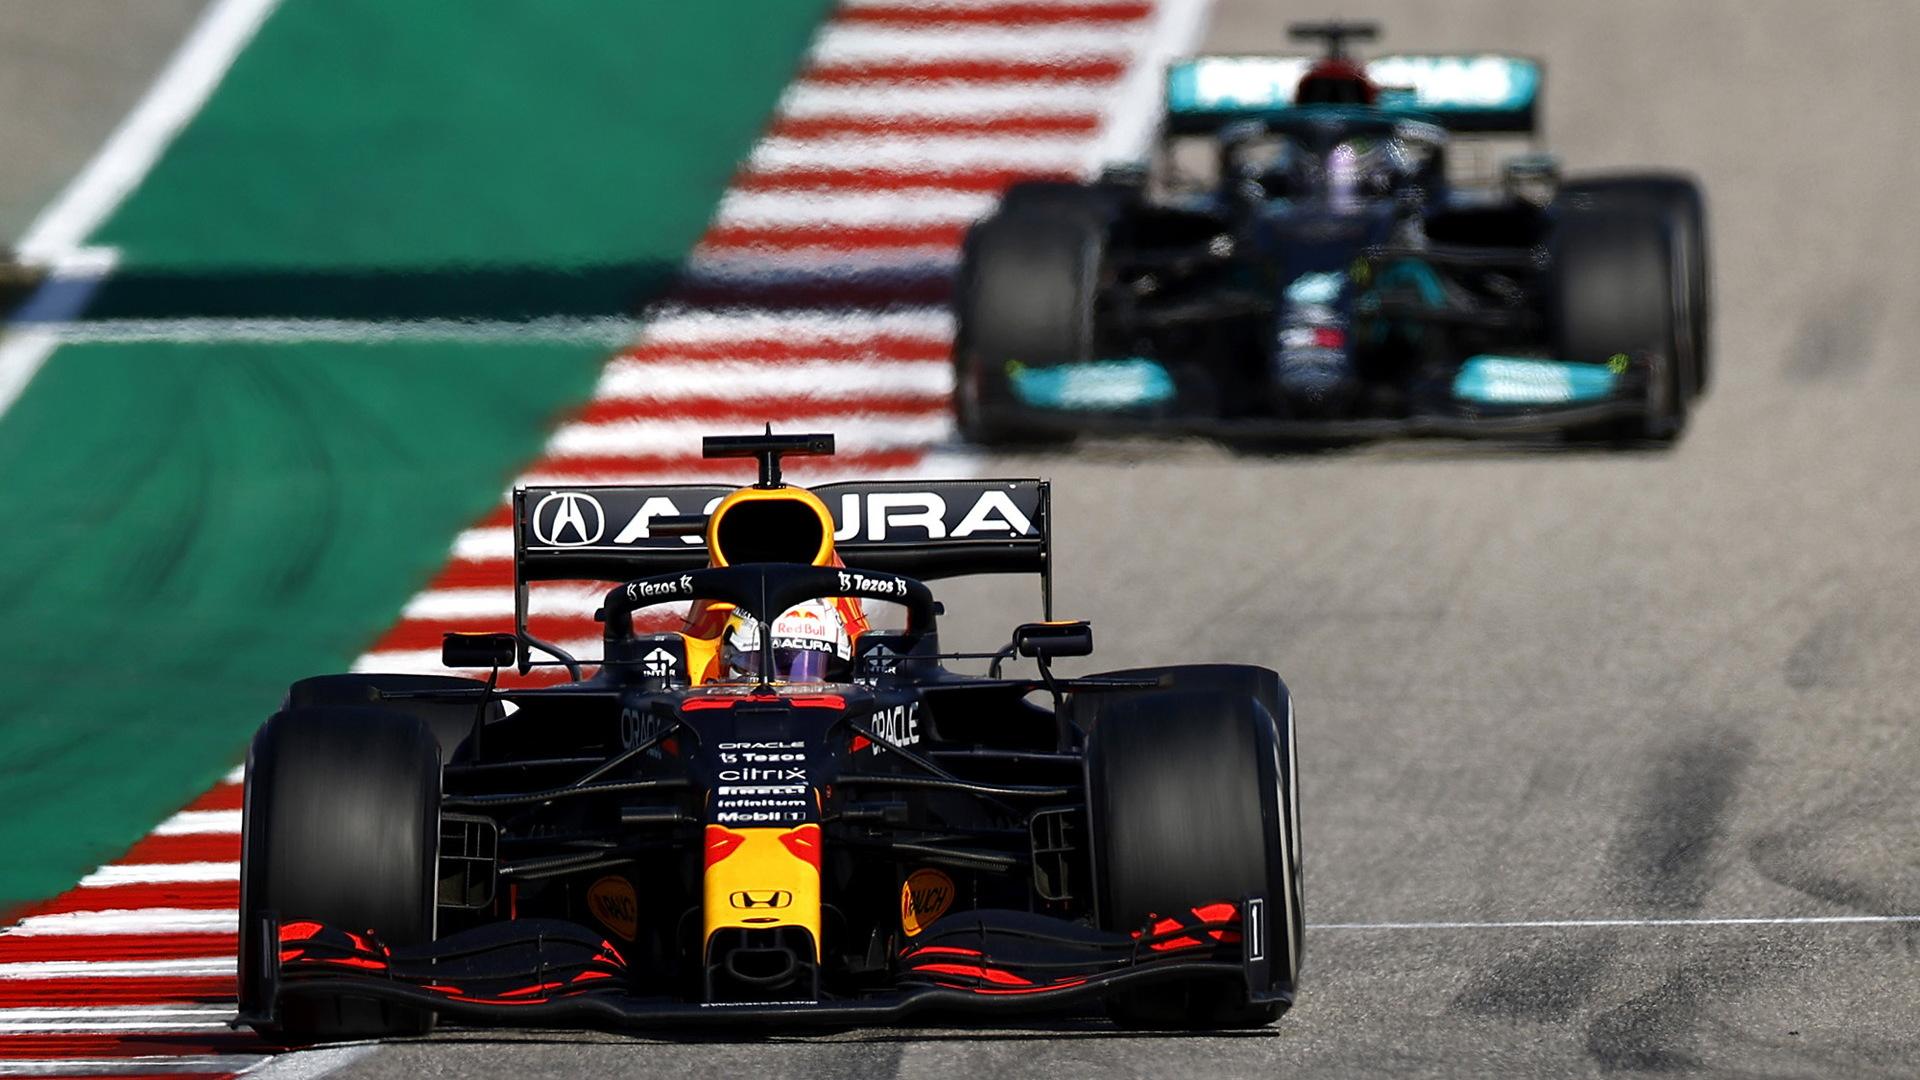 2021 Formula One United States Grand Prix